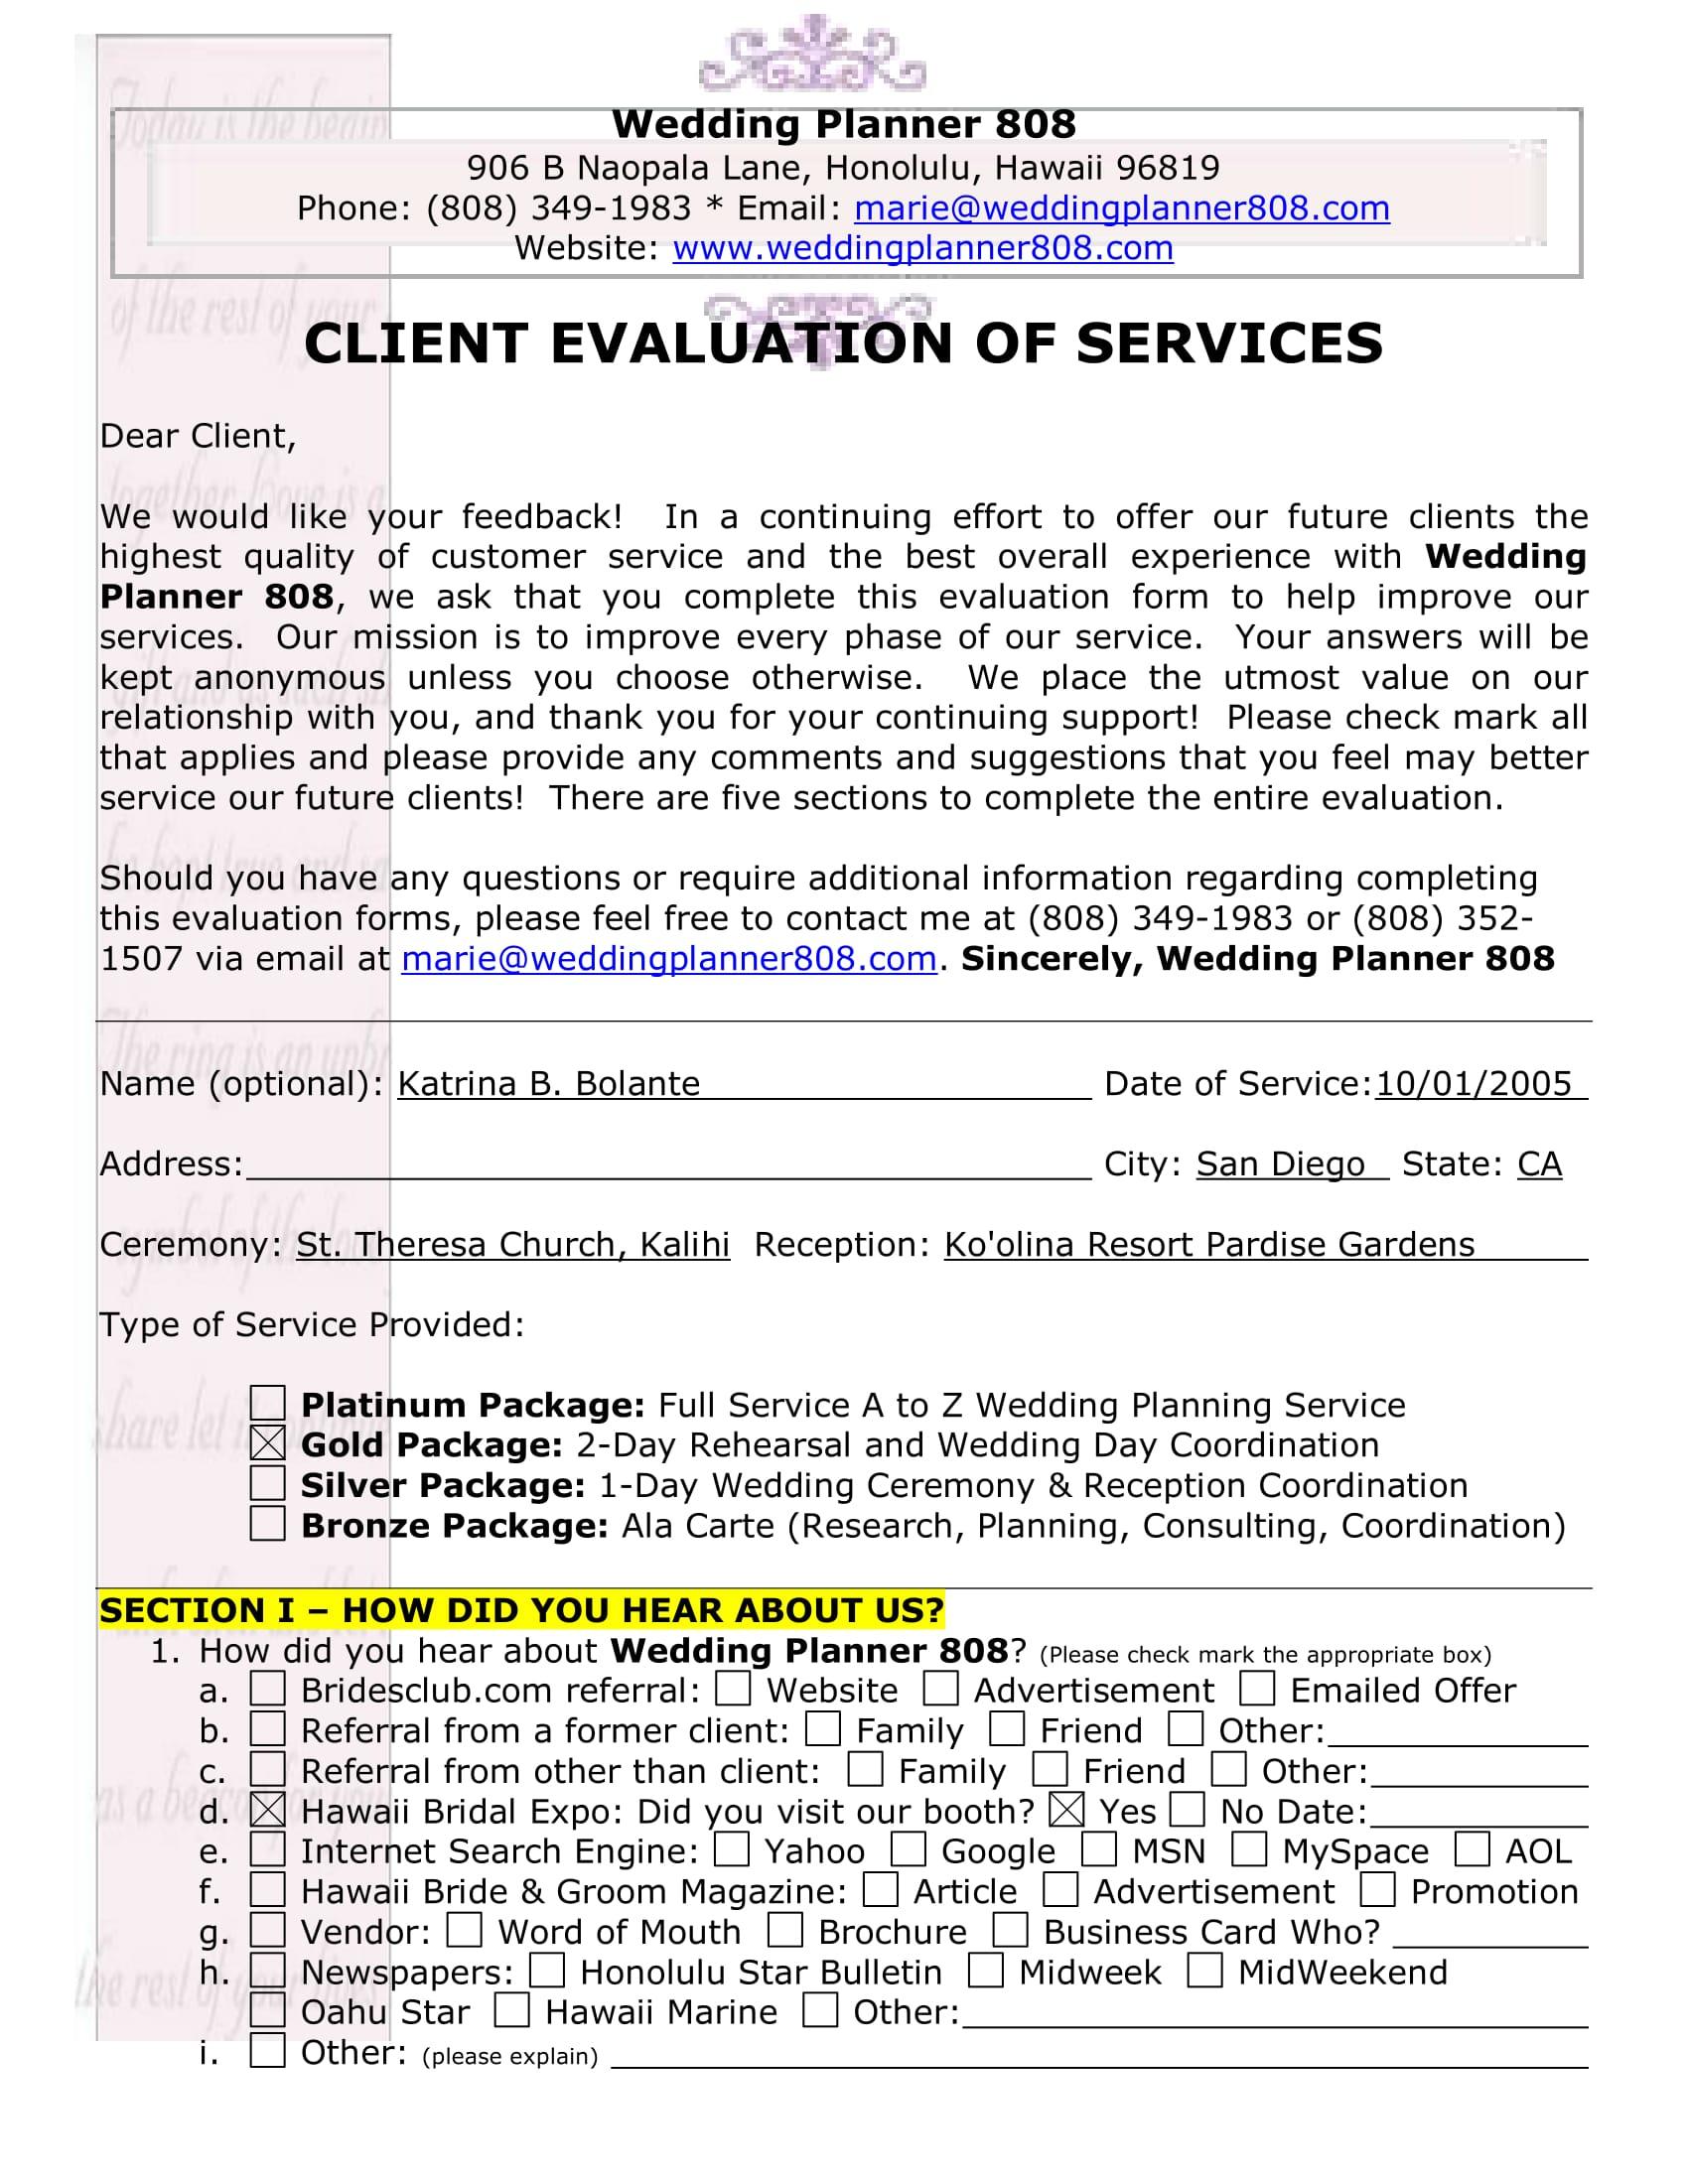 Job Performance Evaluation Form Templates profit and loss – Sample Performance Evaluation Forms